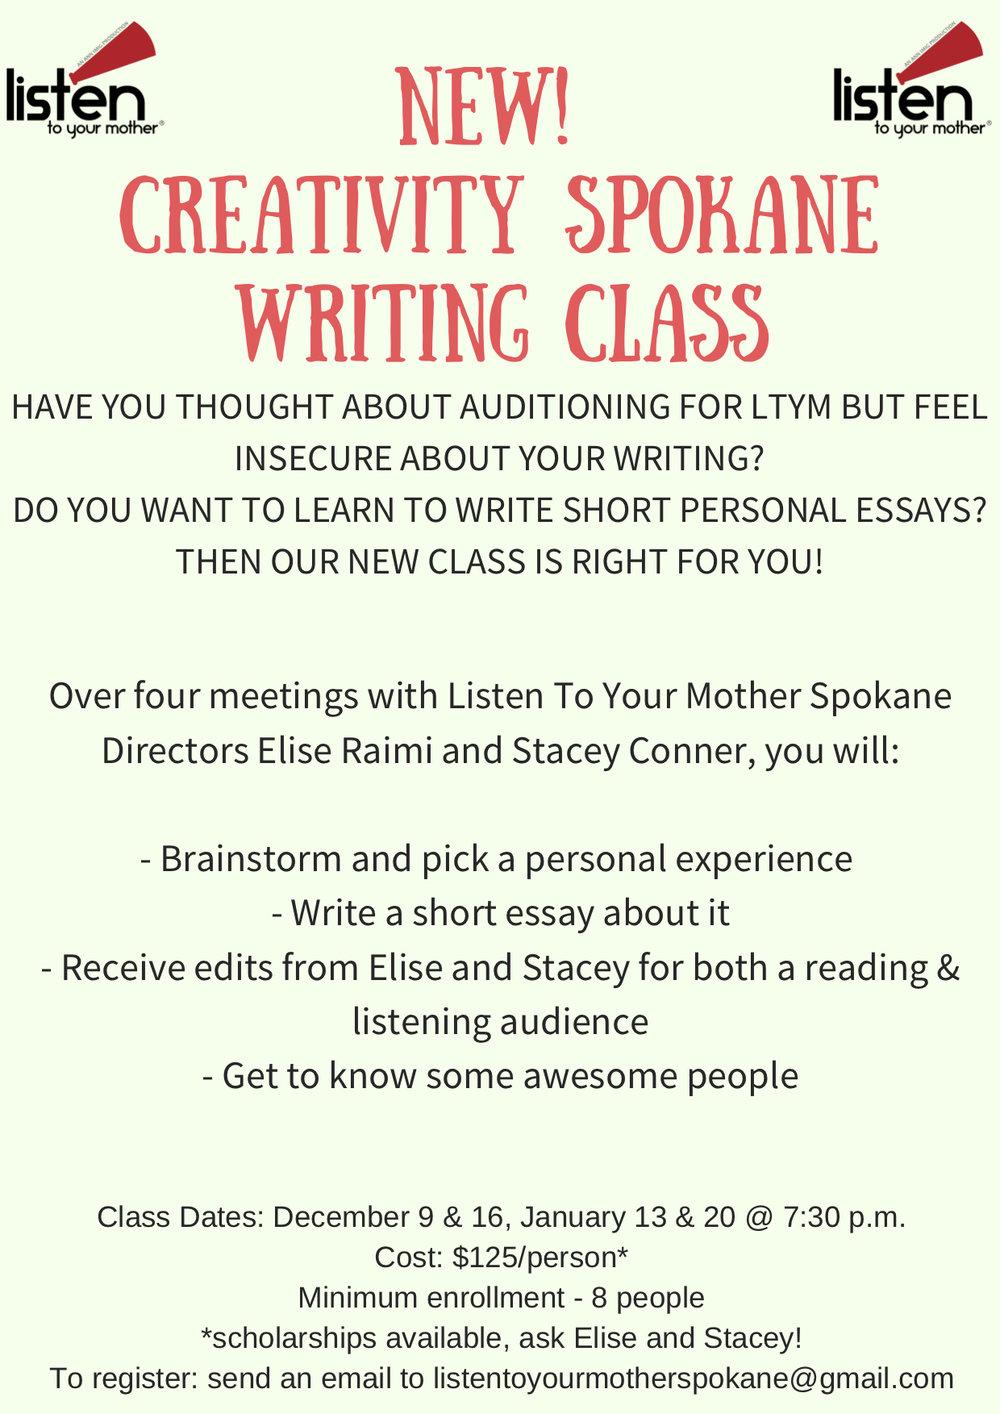 New! Creativity Spokane Writing Class (1).jpg